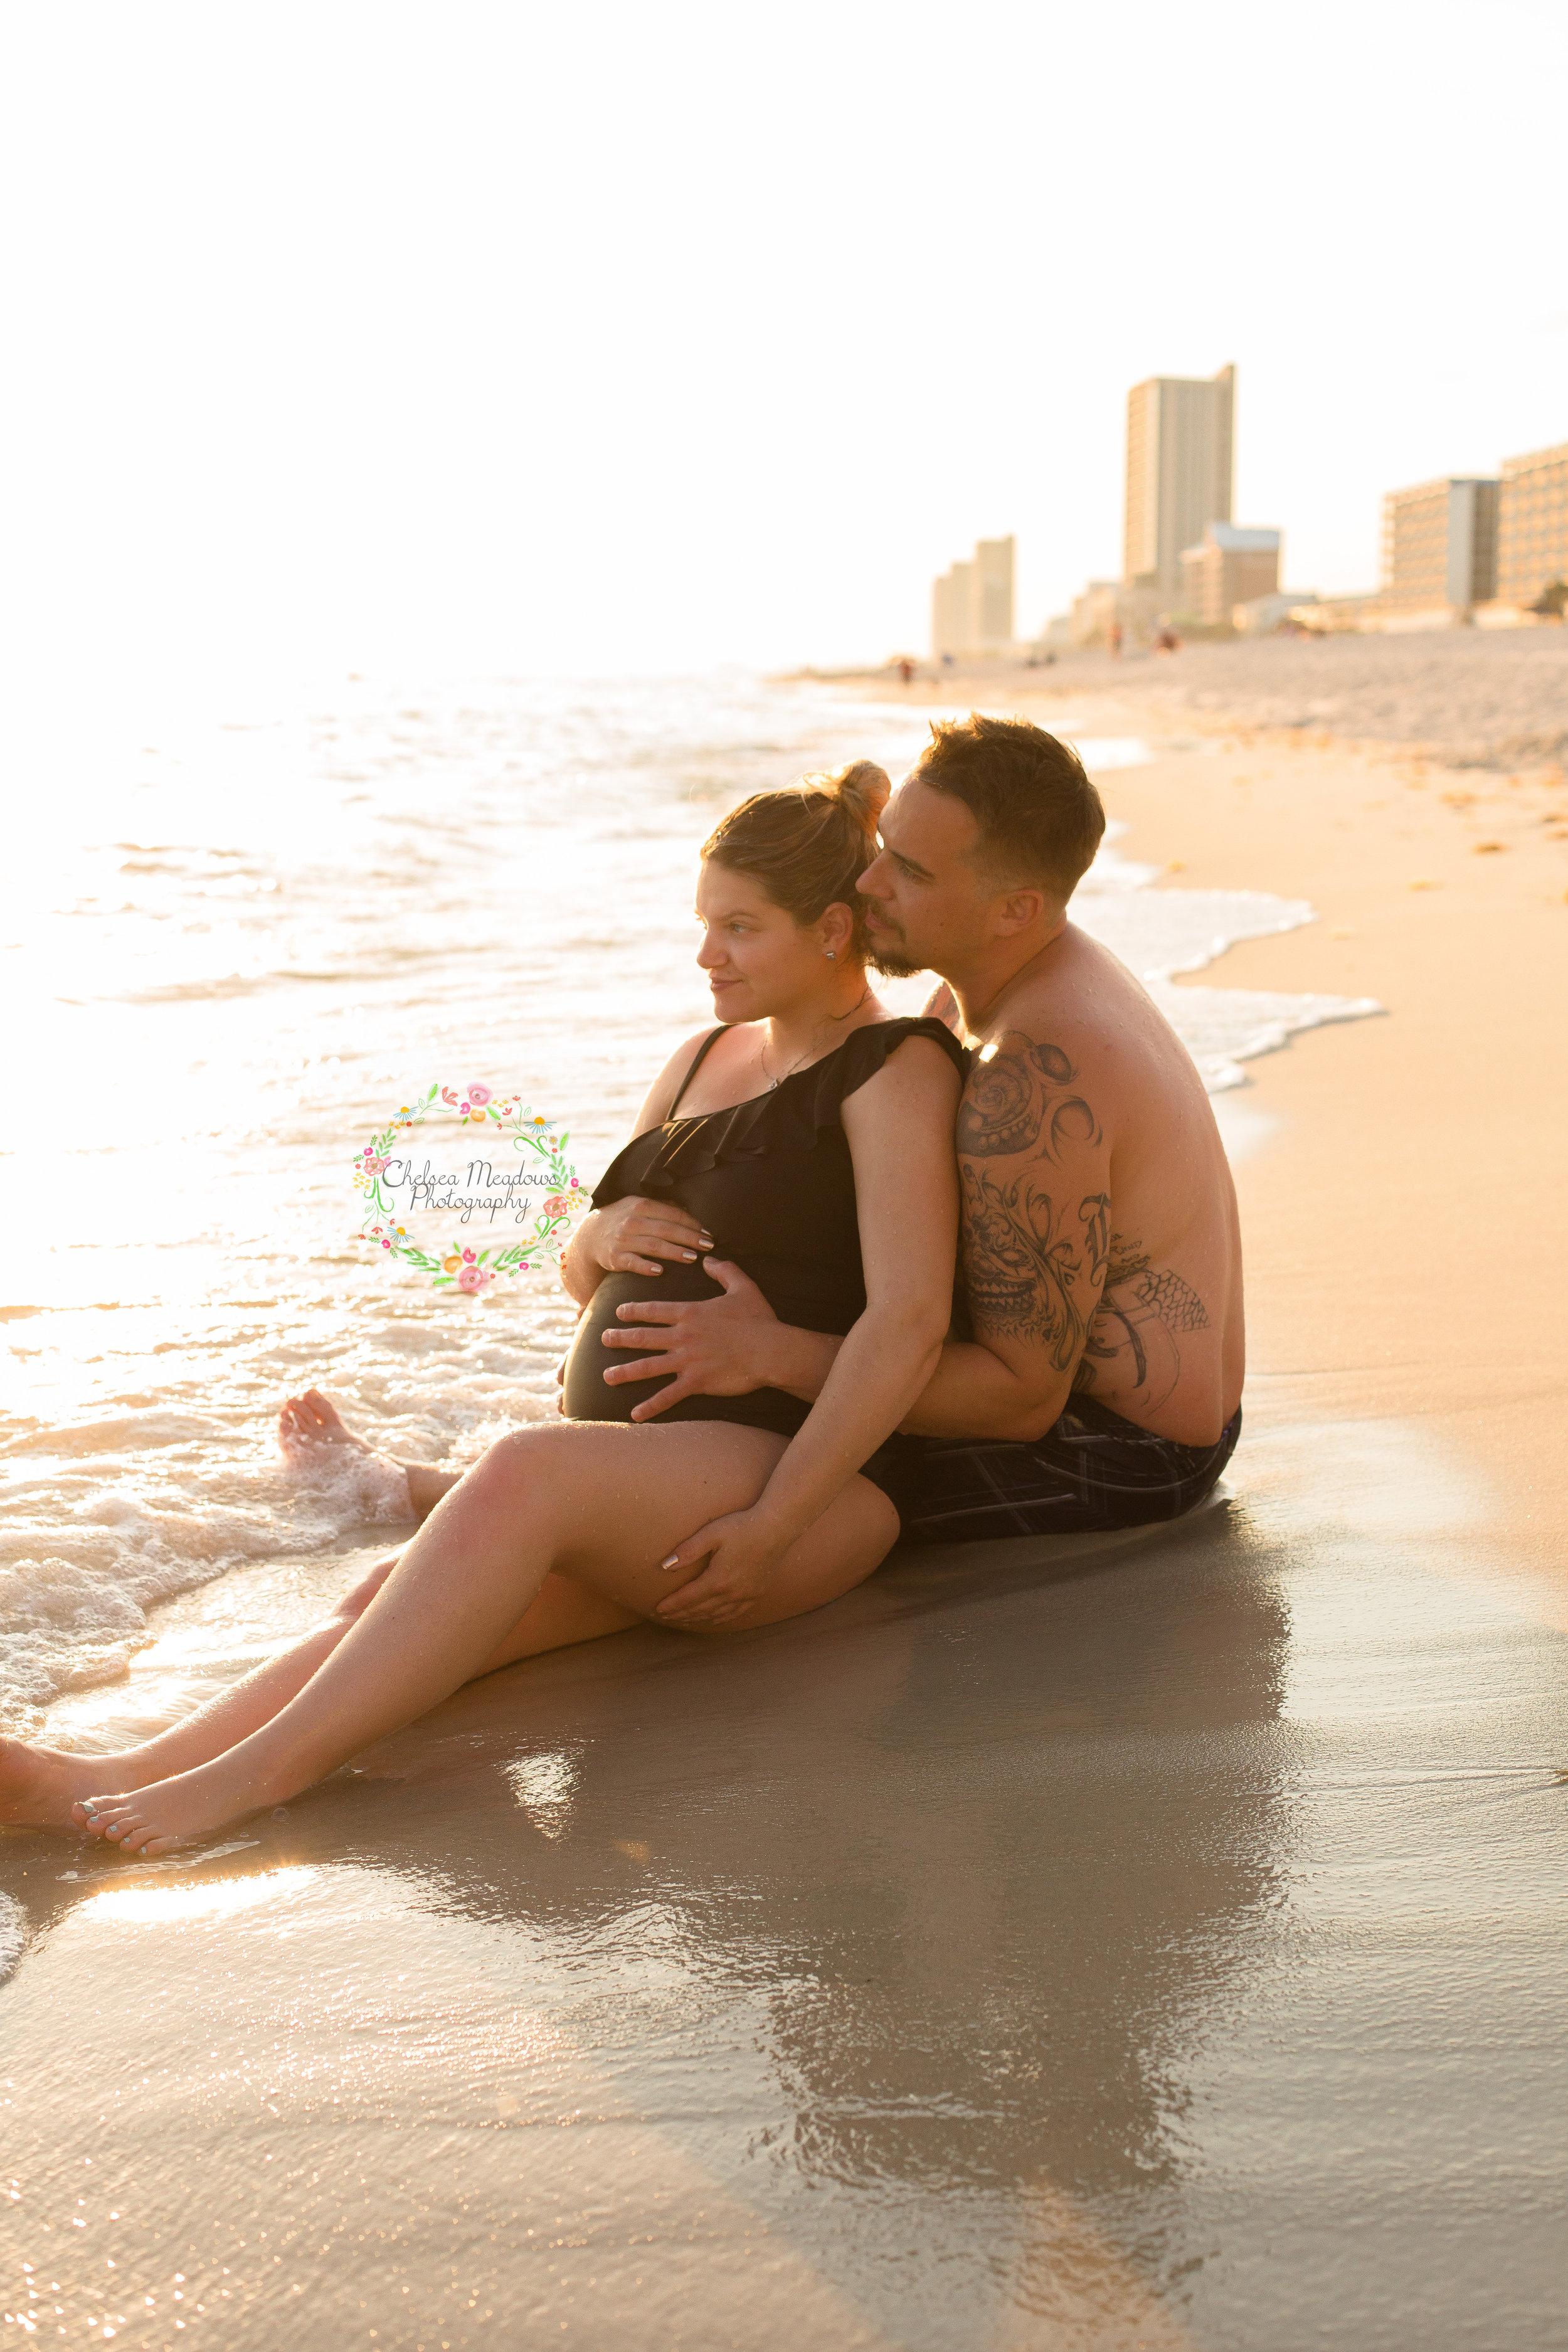 Nicole & Drew Beach Maternity - Nashville Maternity Photography - Chelsea Meadows Photography (67).jpg